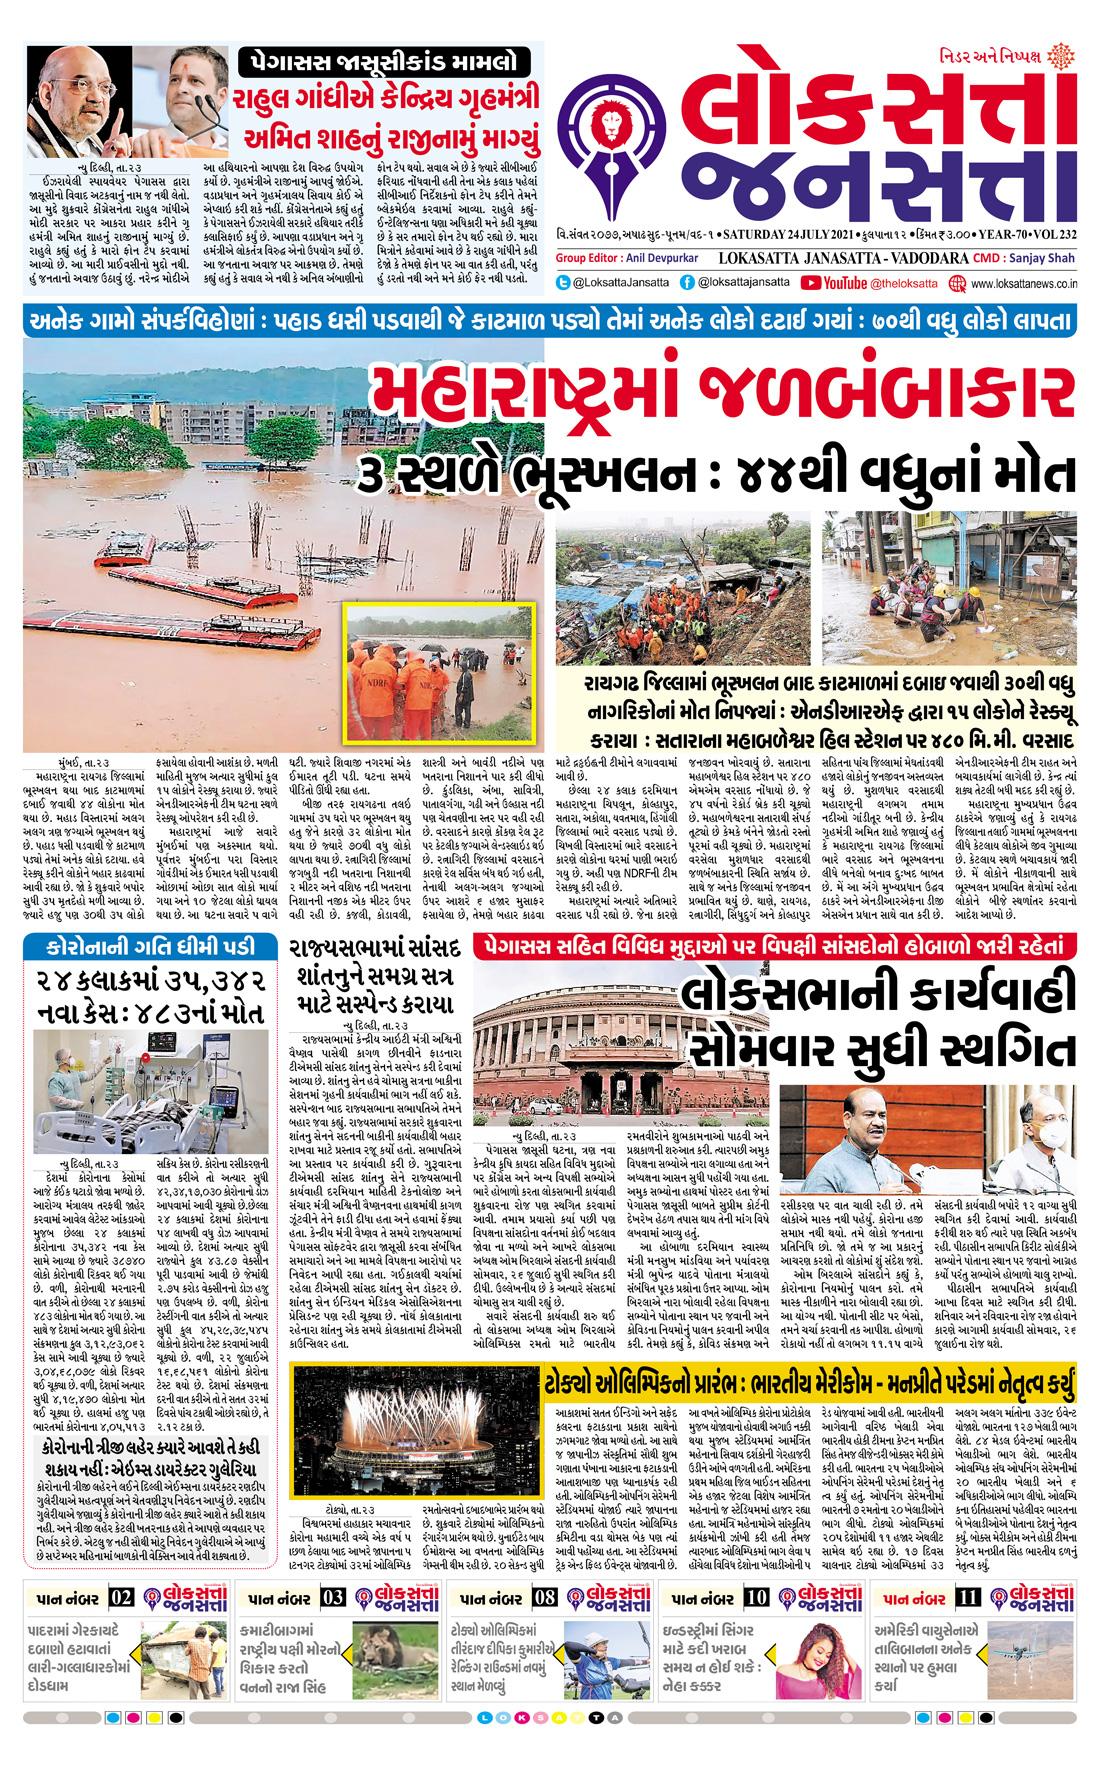 Loksatta Jansatta News Papaer E-paper dated 2021-07-24   Page 1